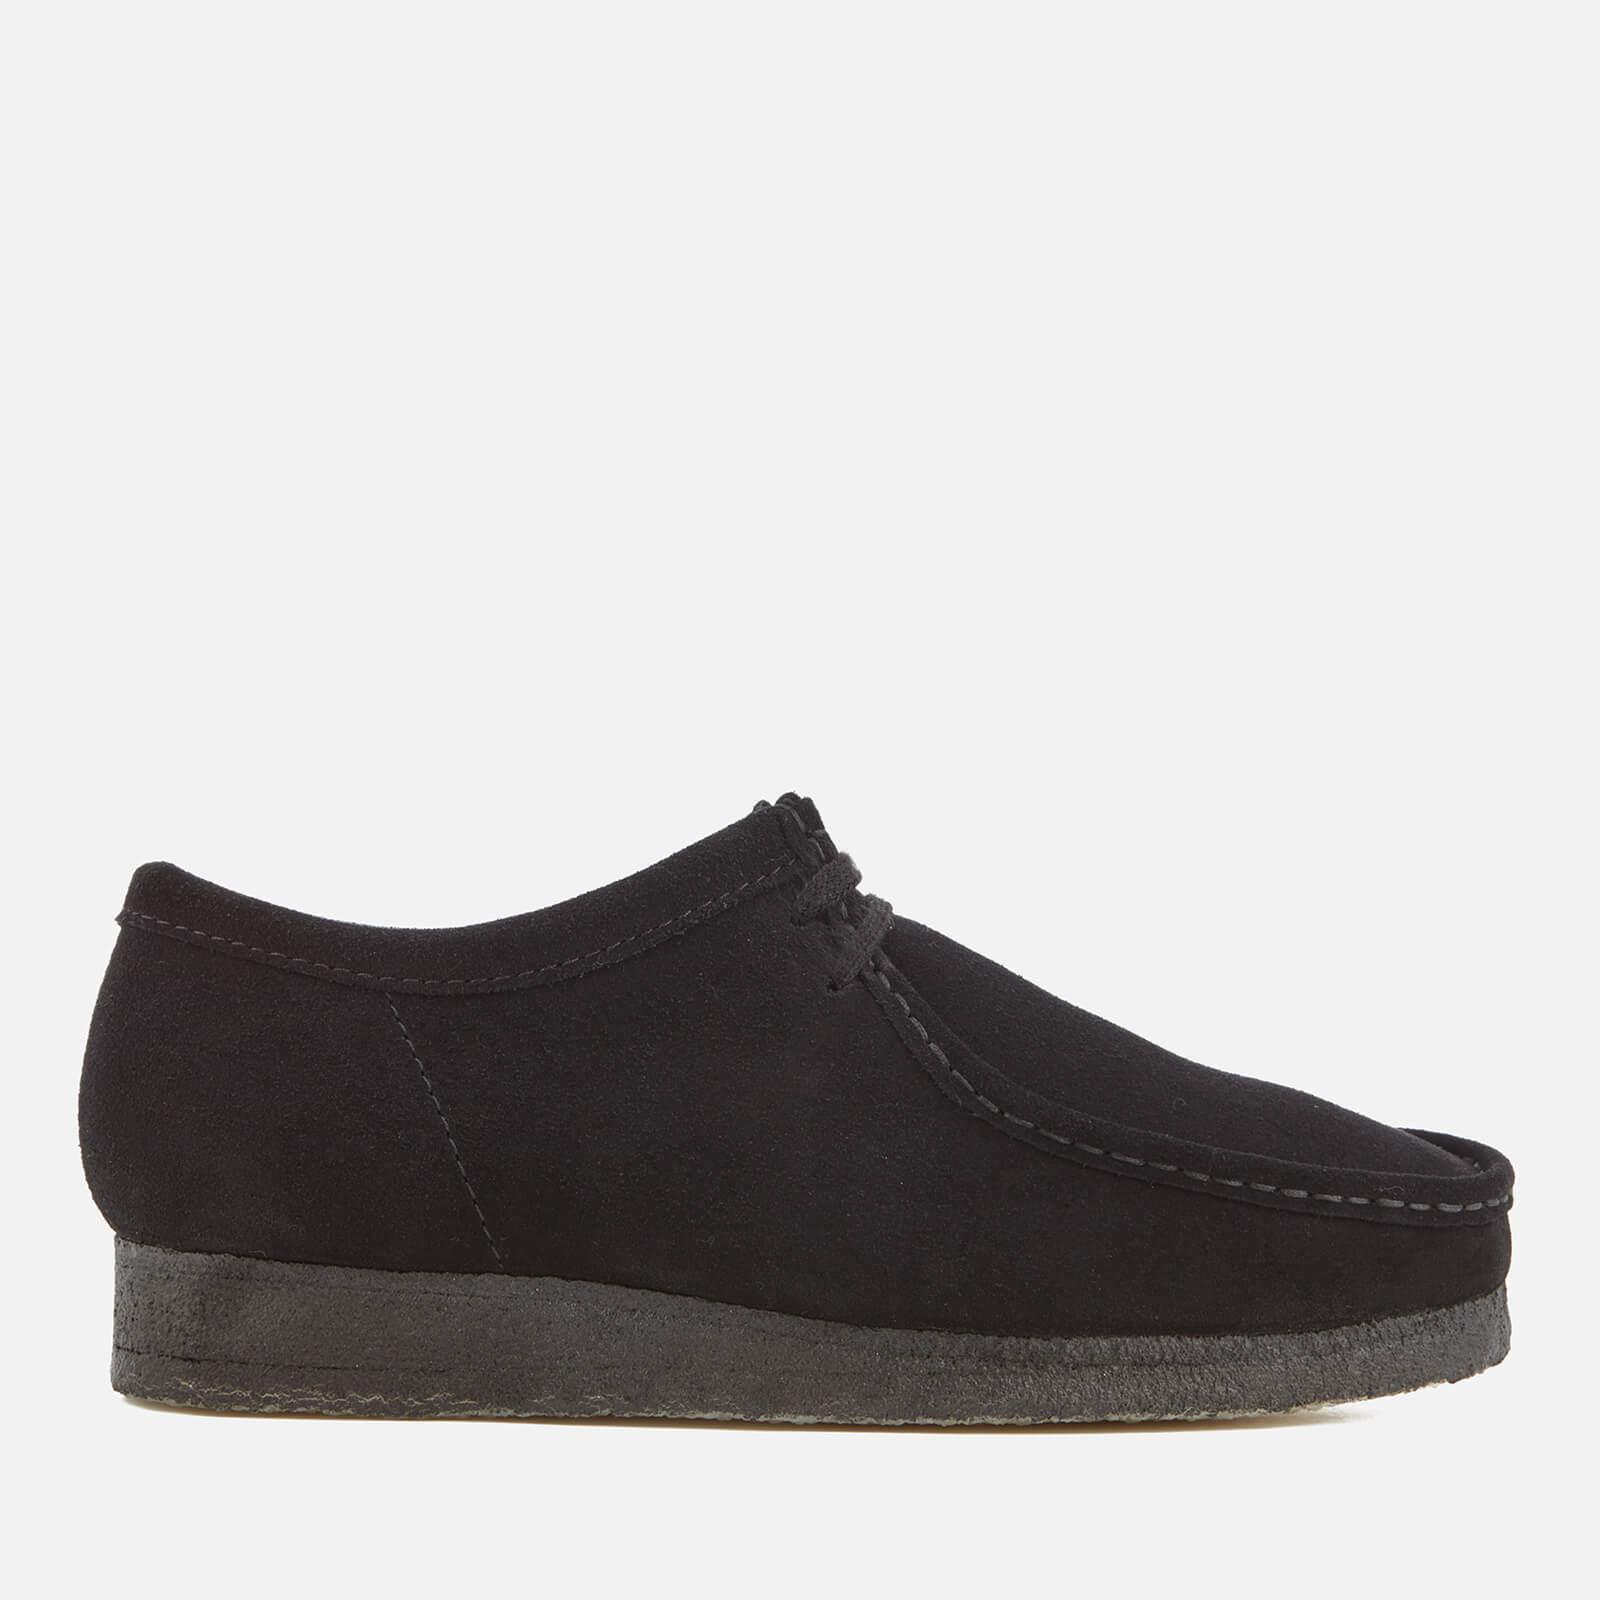 Clarks Originals Men's Wallabee Suede Shoes - Black - UK 11 - Black